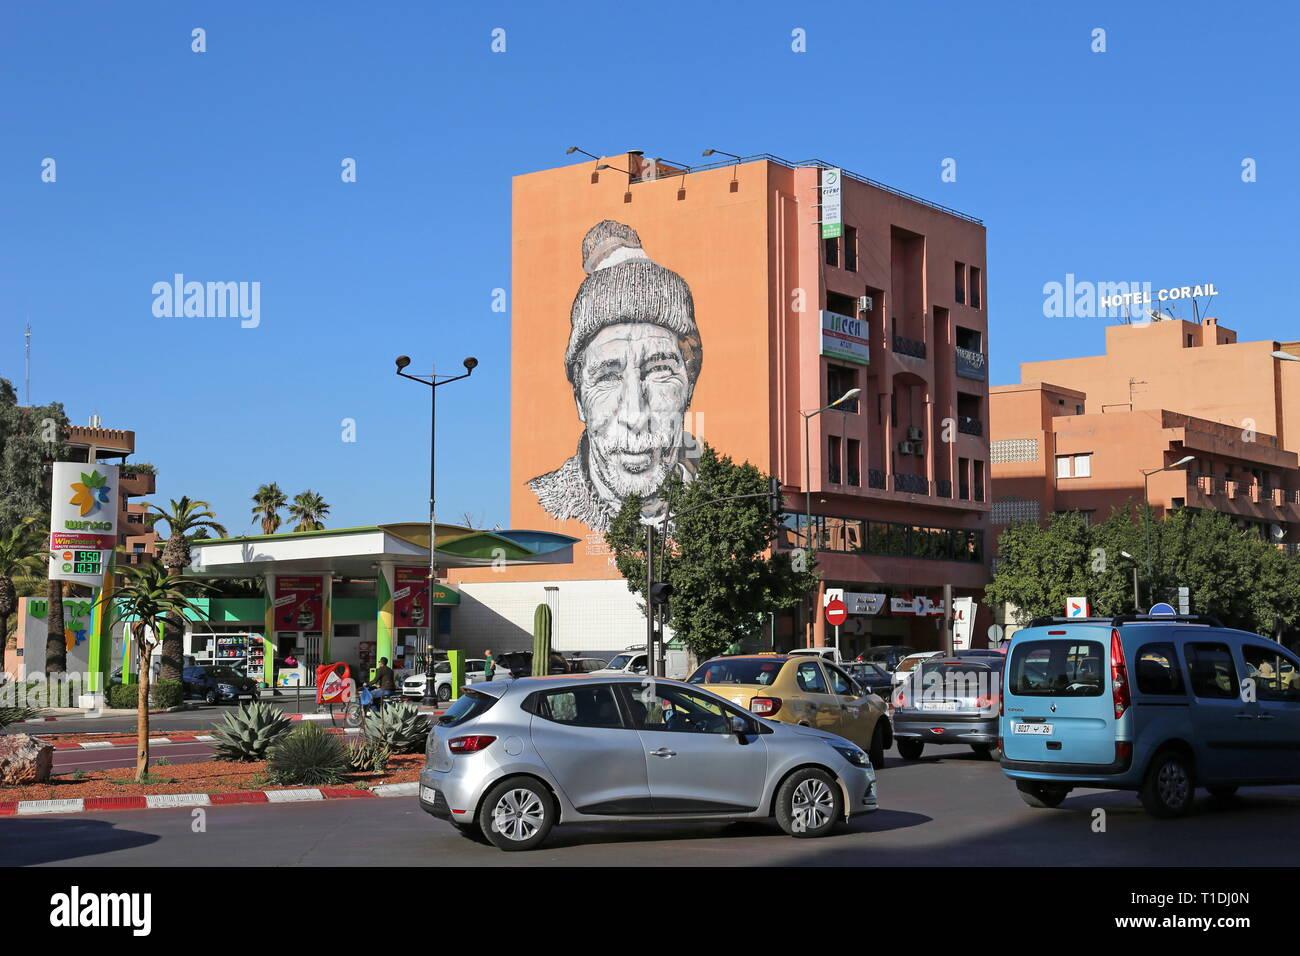 Aziz, the local mason, part of Hendrik Beikirch's 'Tracing Morocco' series (see info). Gueliz, Marrakesh, Marrakesh-Safi region, Morocco, north Africa - Stock Image